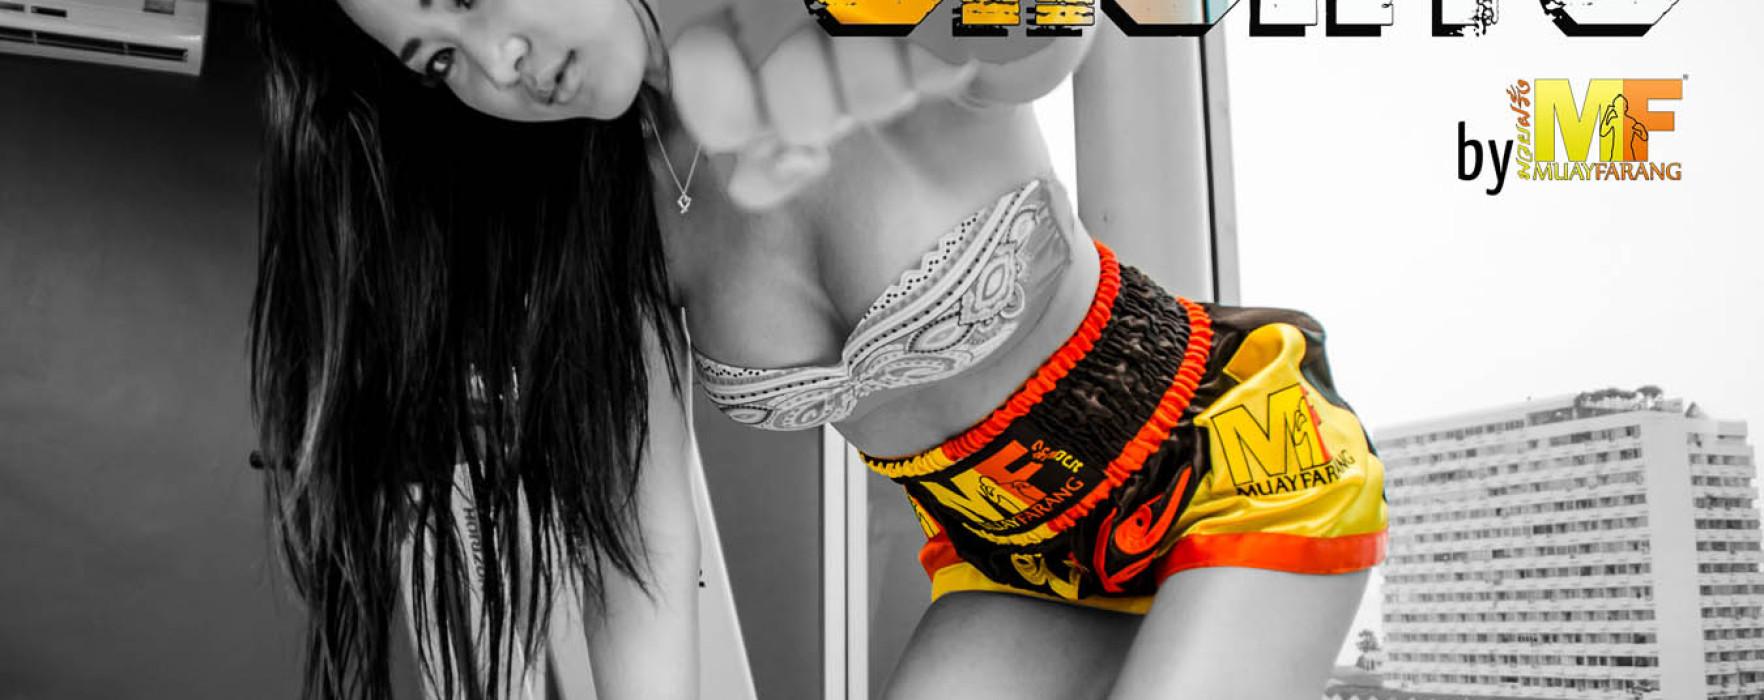 Muay Farang Catalog 2015